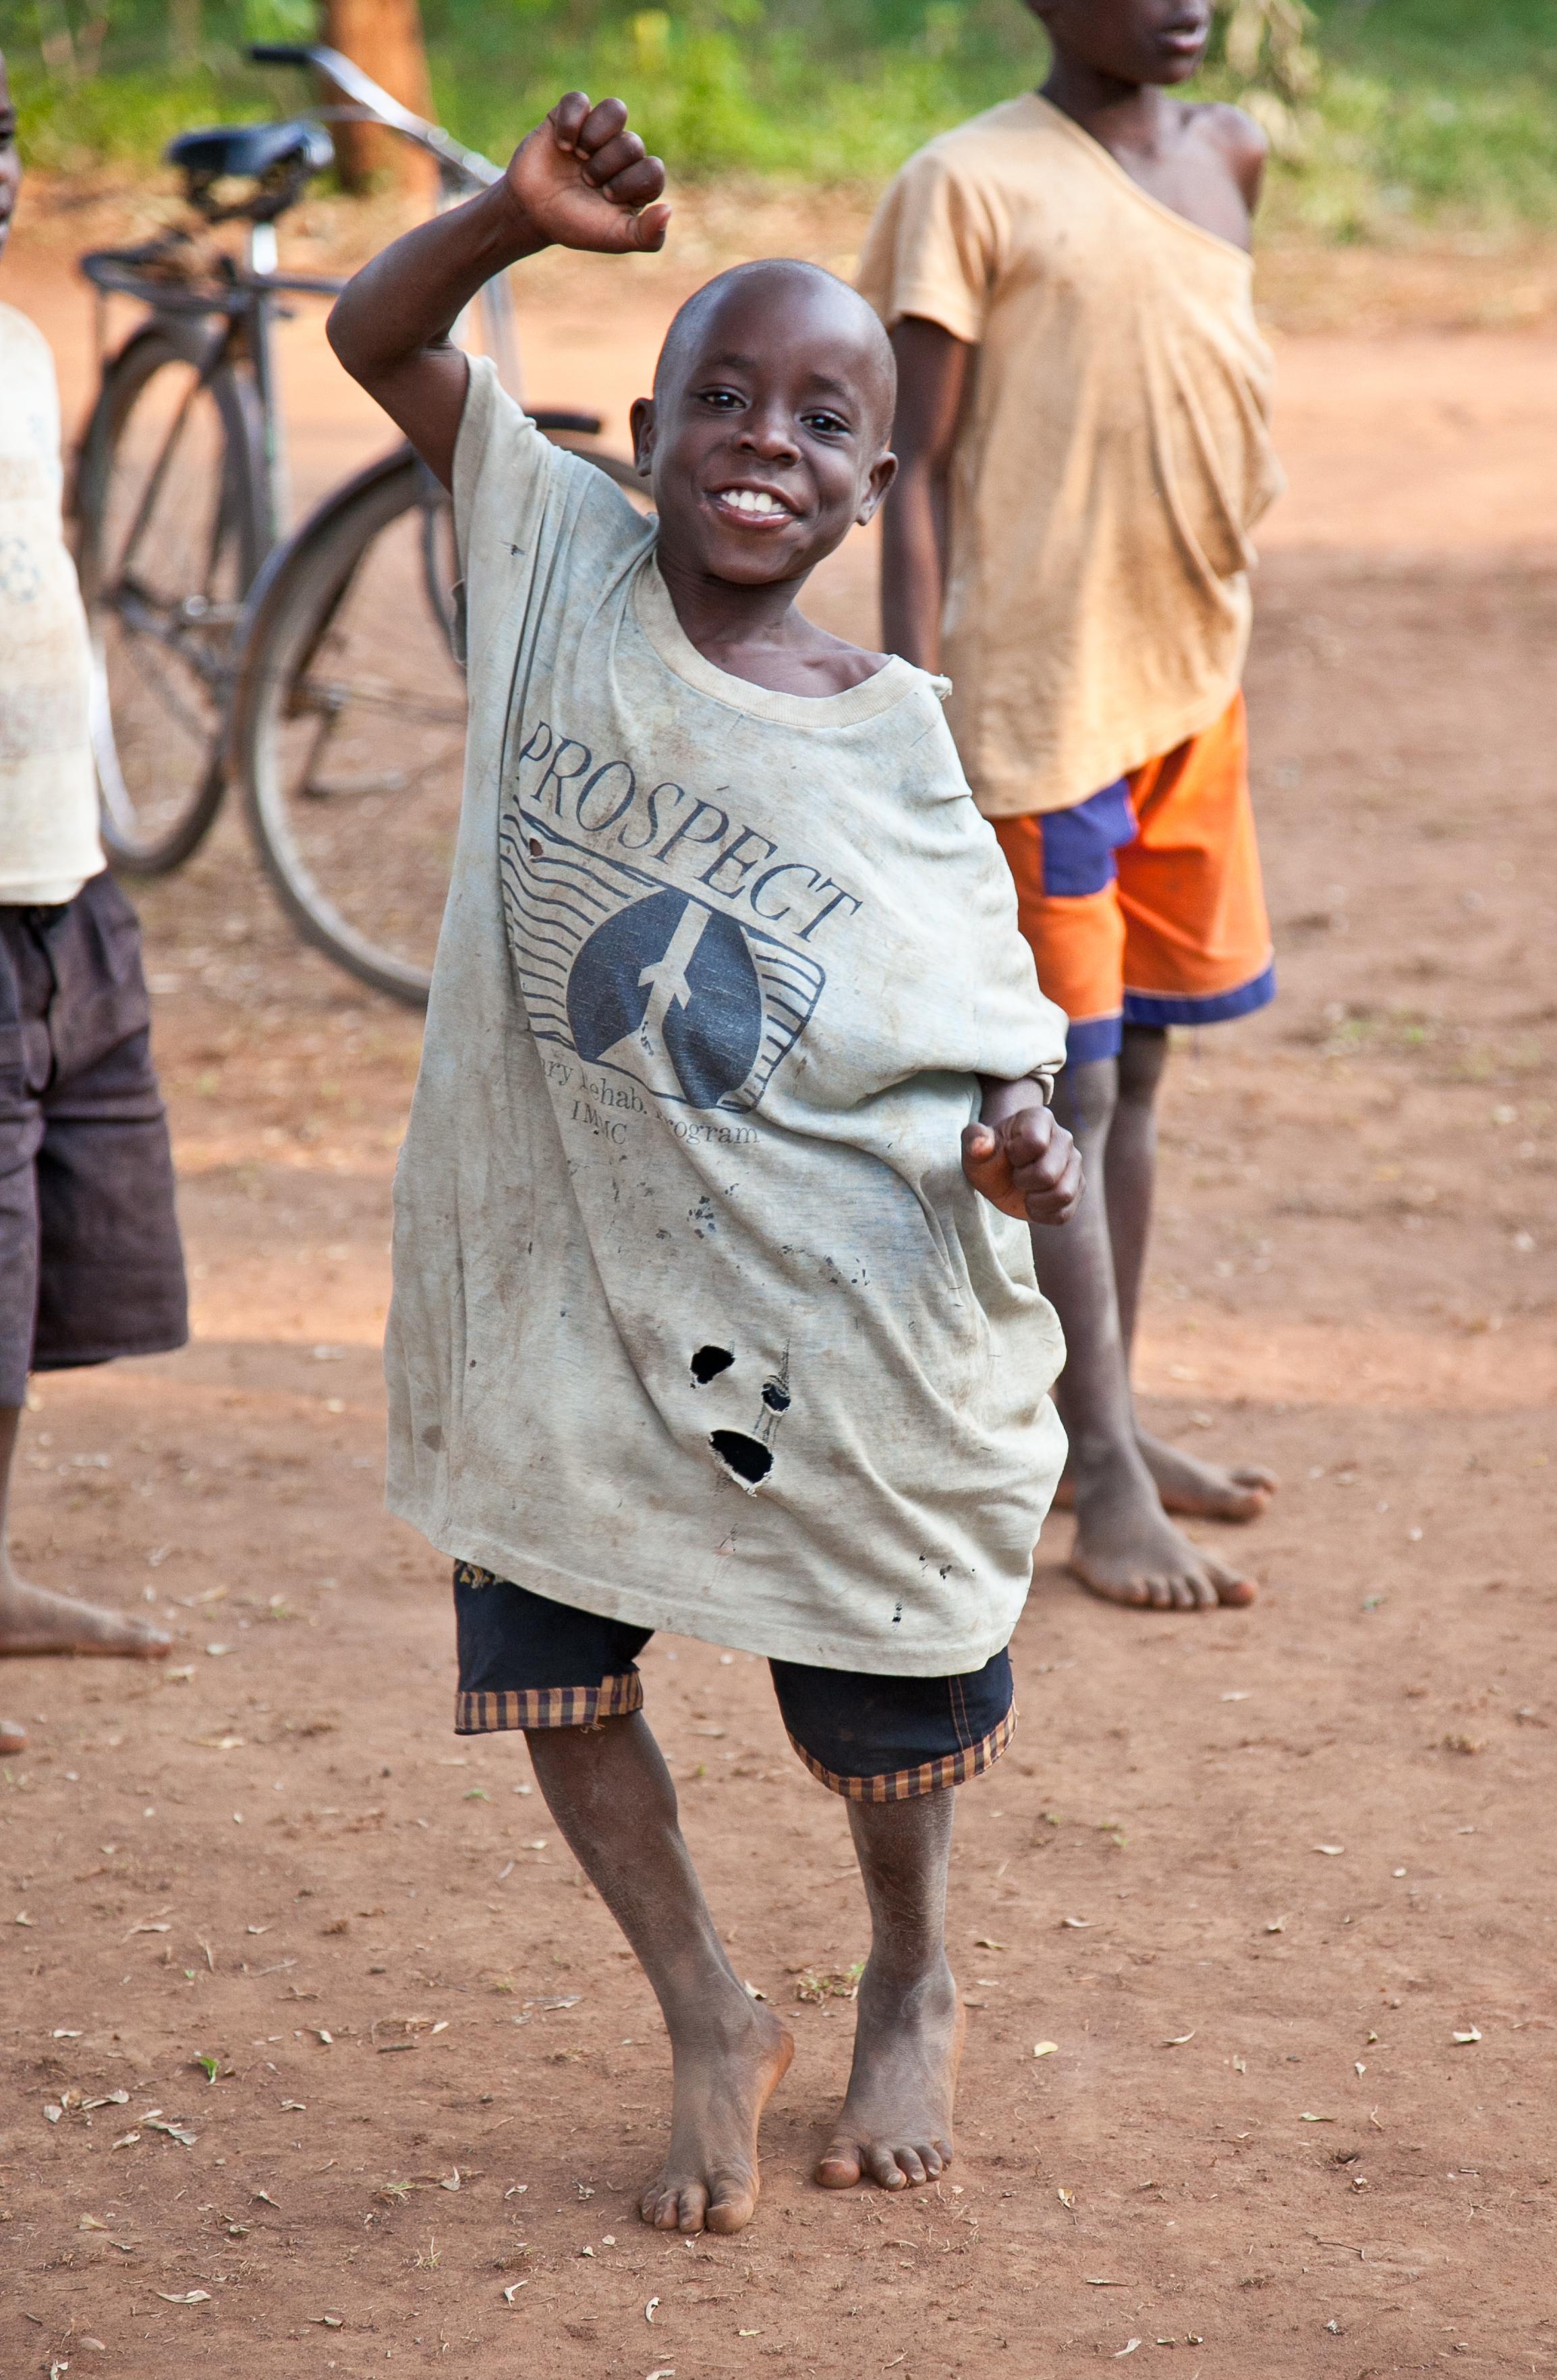 trisa-taro-G-dancing-village-uganda.jpg